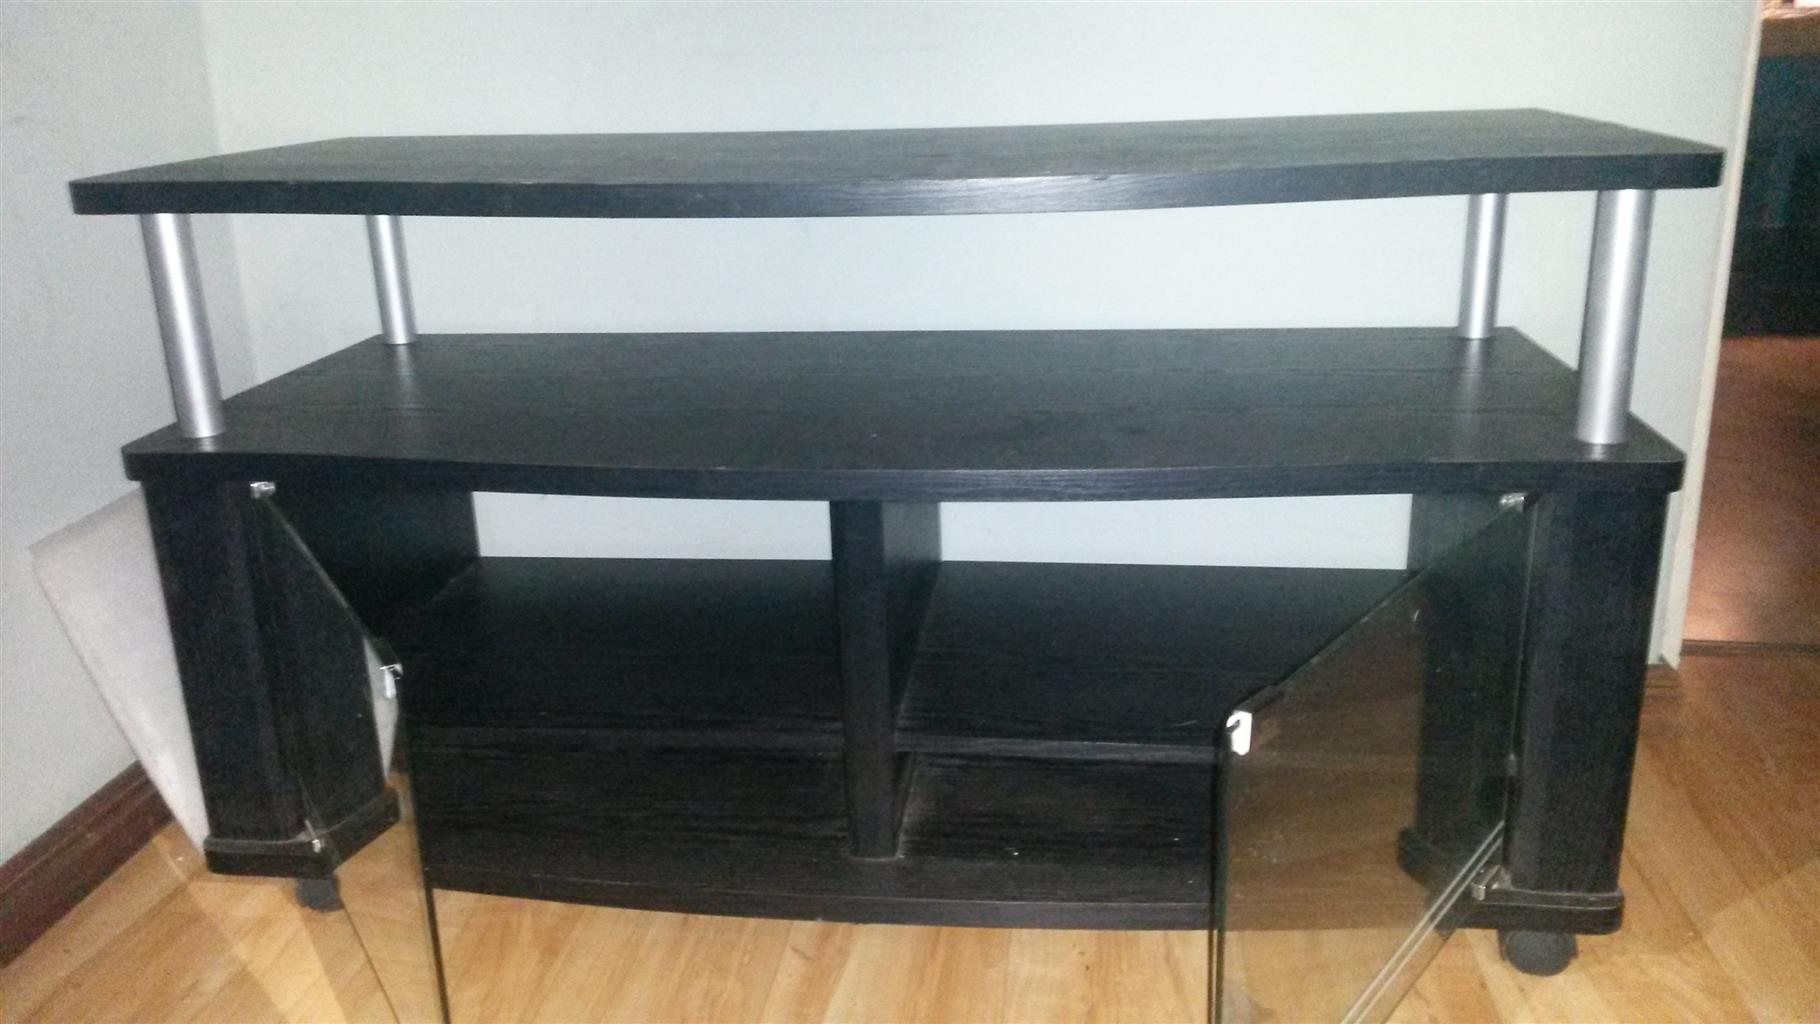 Entertainment Unit / TV Stand for sale